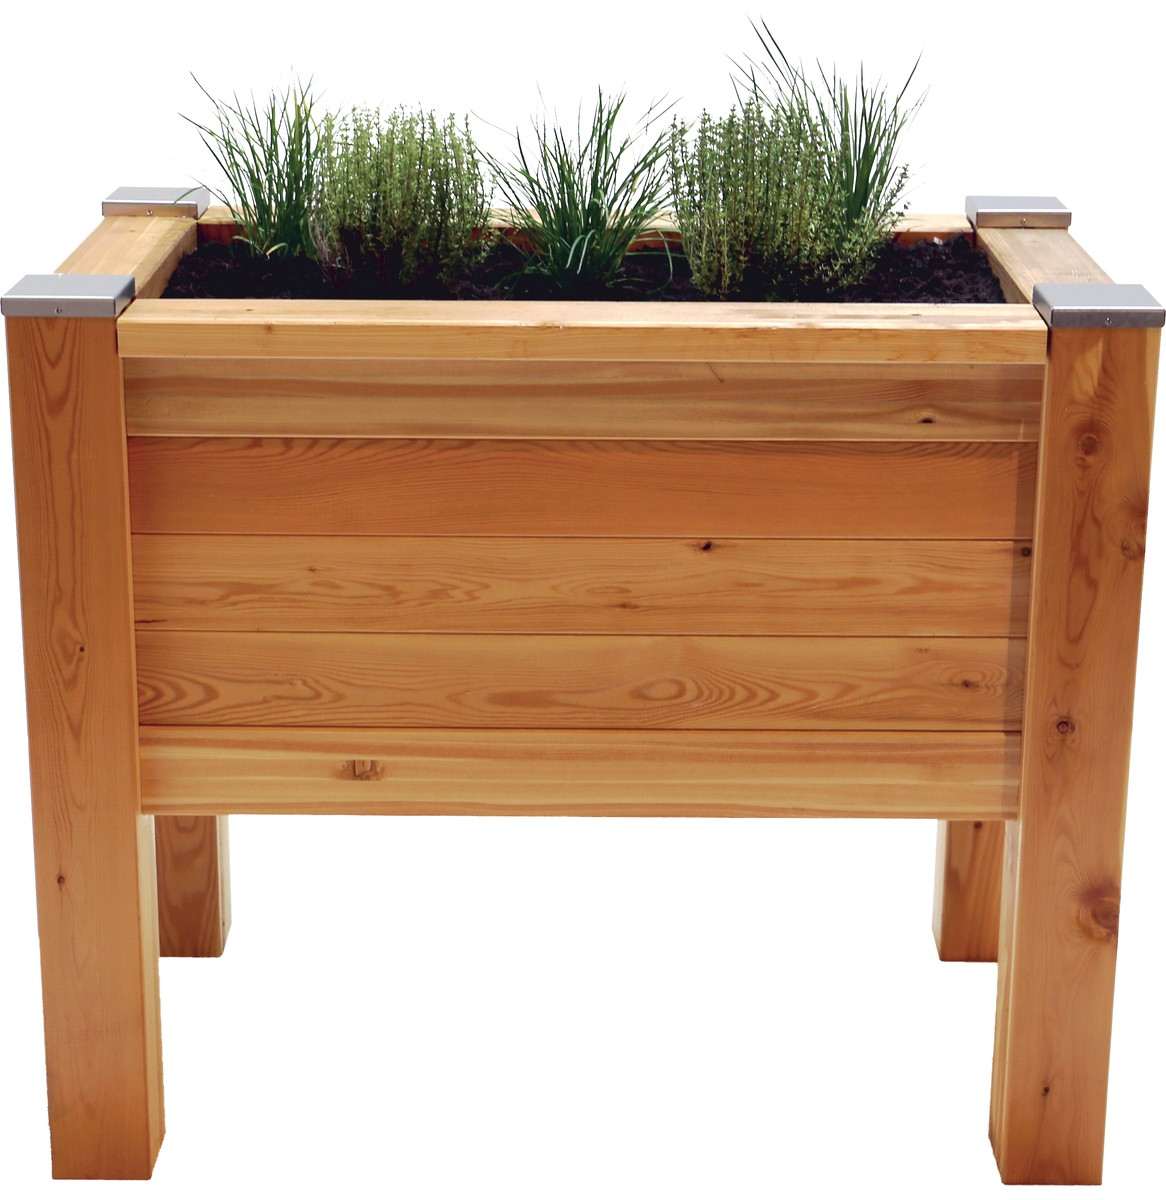 Timberra Hochbeet De Terra 575901 De Terra Kaufen Bei Www 1a